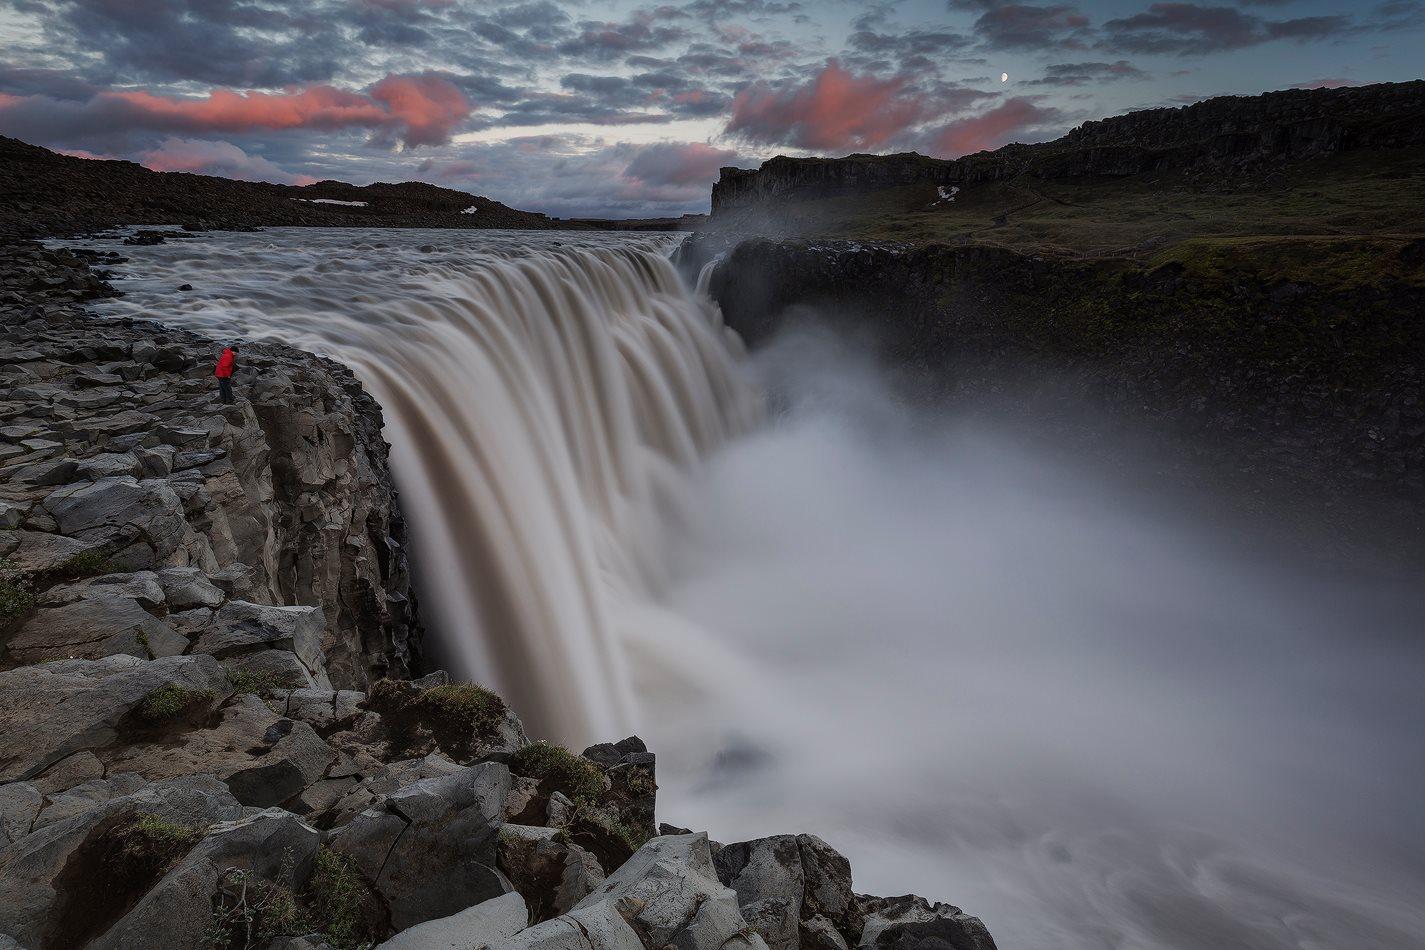 Jökulsárgljúfur峡谷的黛提瀑布是欧洲最汹涌的瀑布